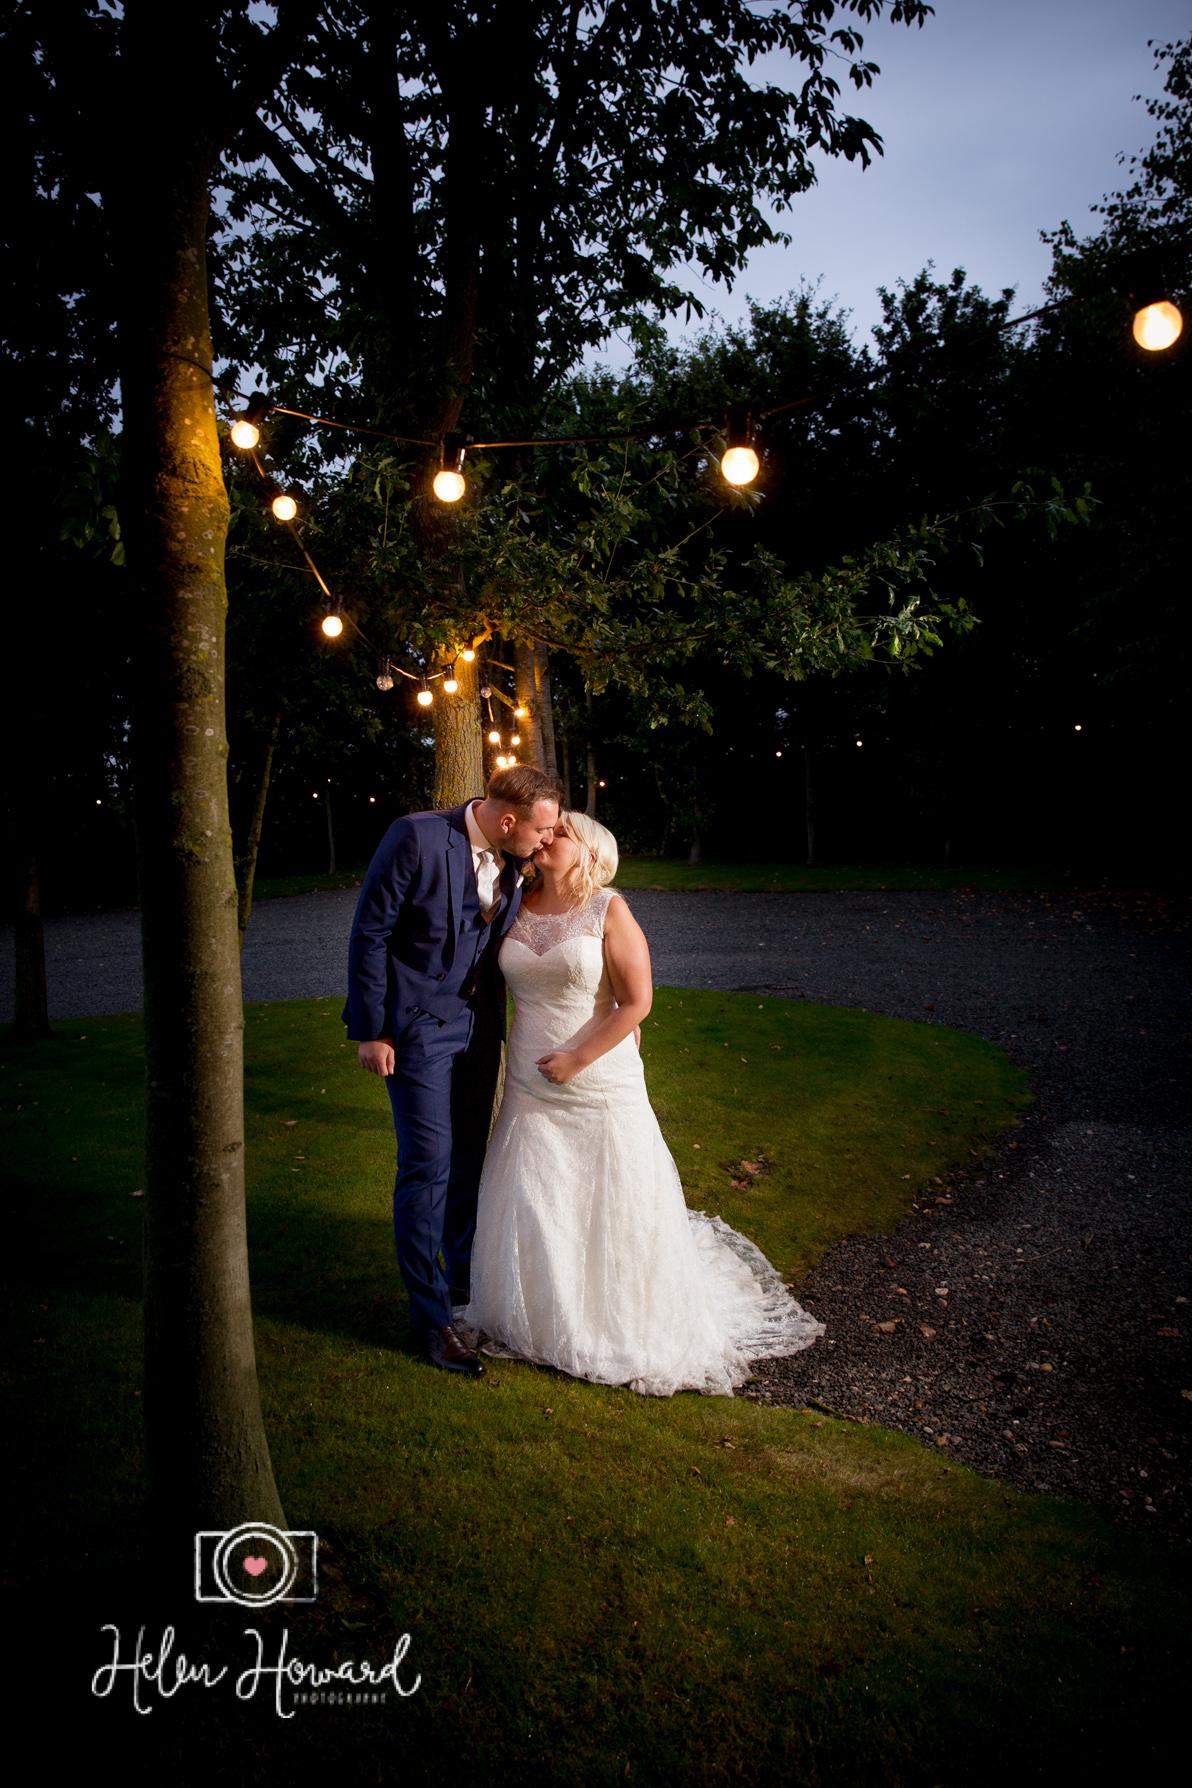 Shustoke Farm Barns Wedding Photography by Helen Howard-43.jpg